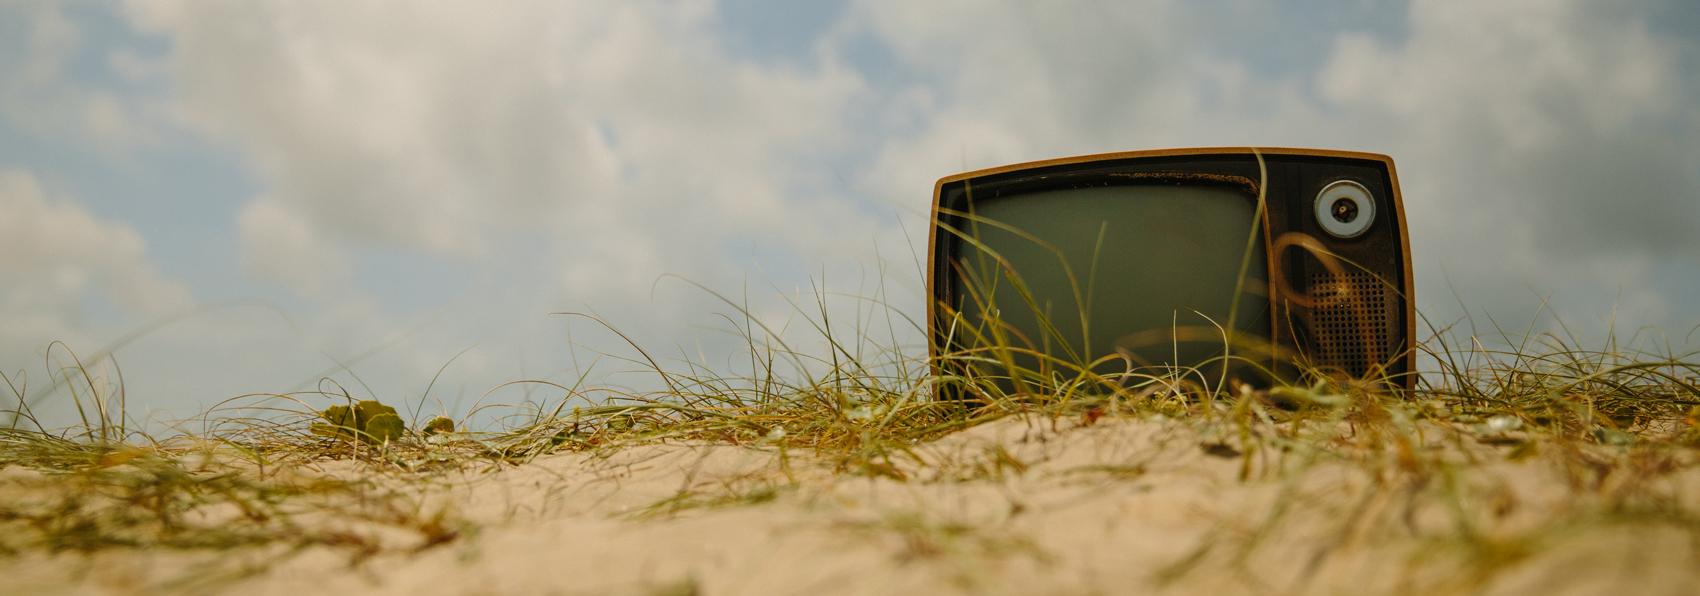 tv_sand